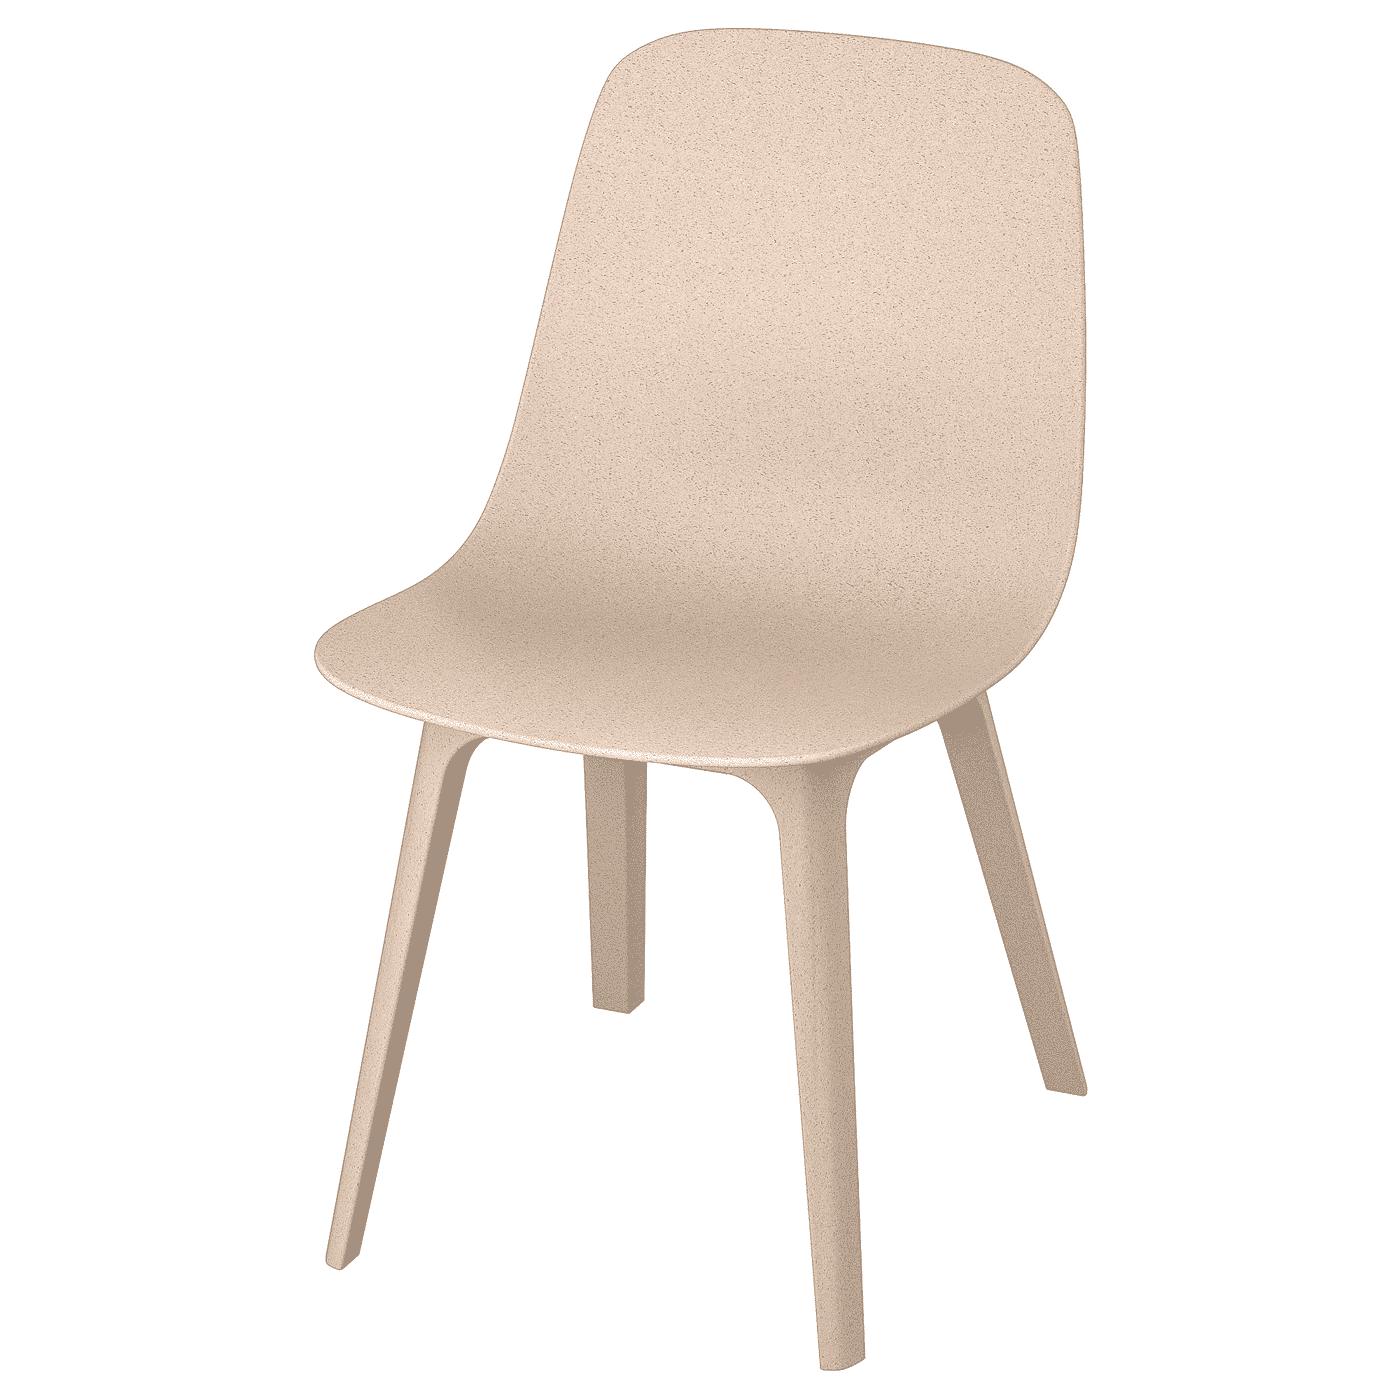 OGDER Chair